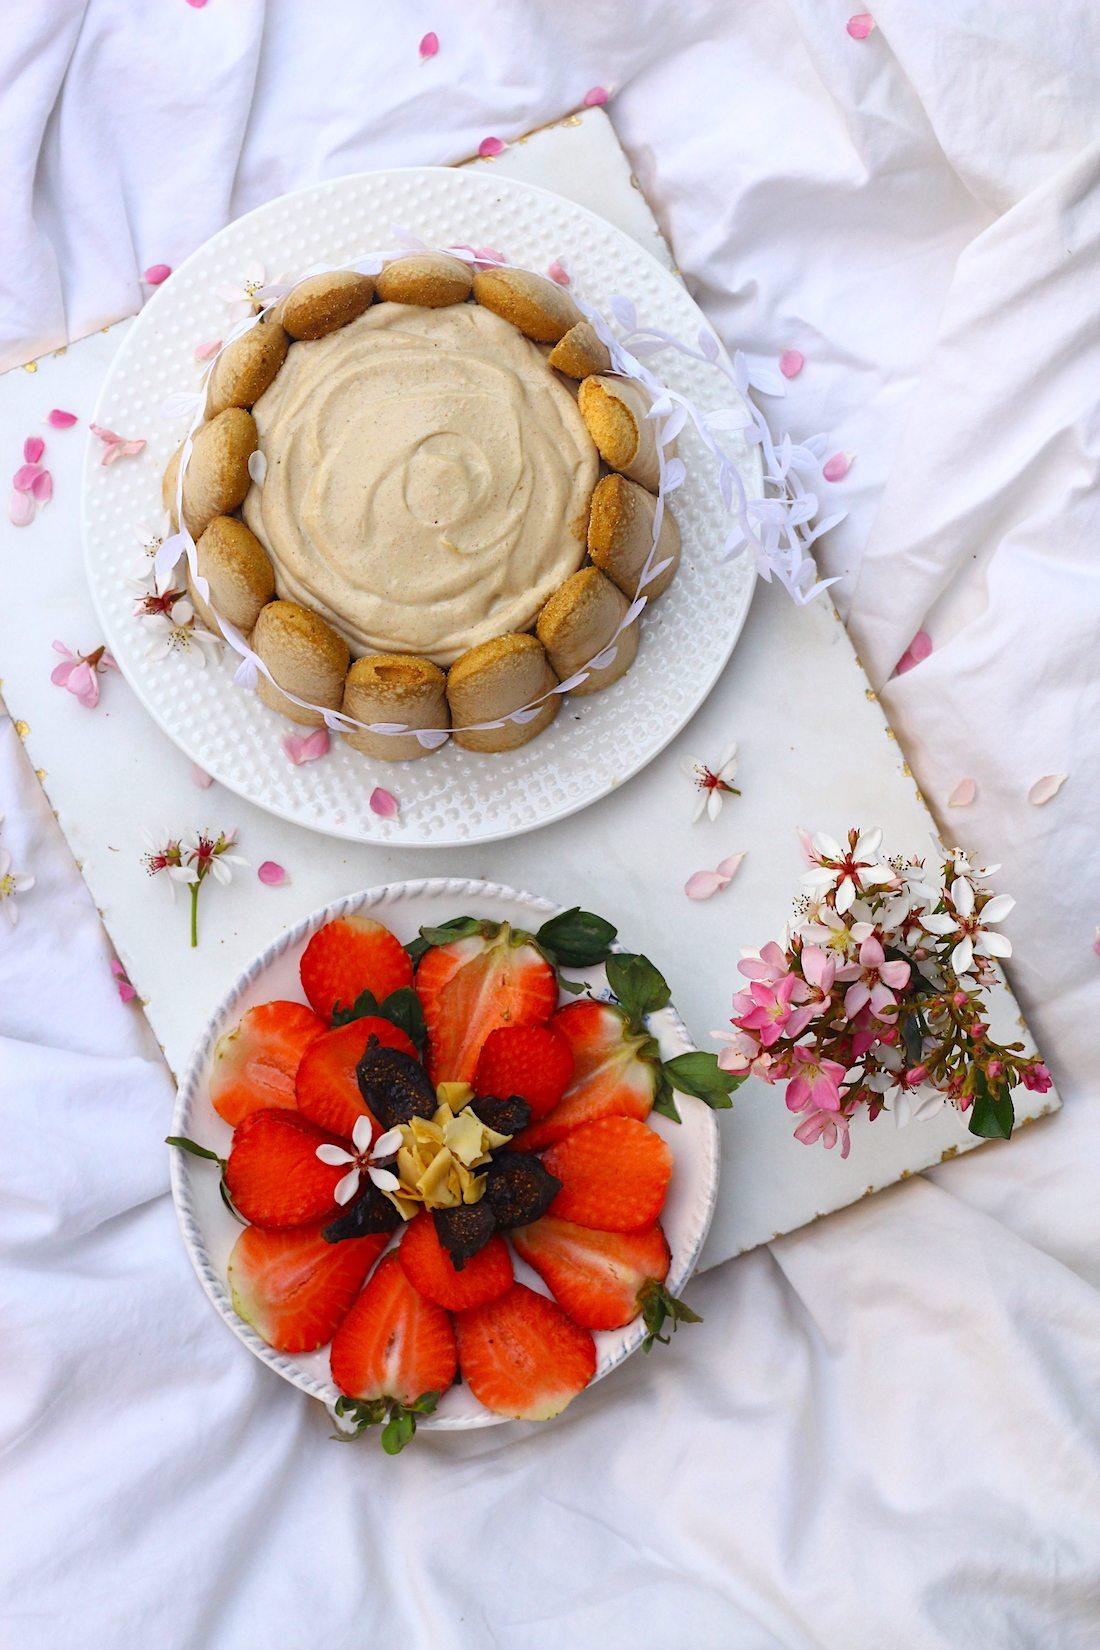 Gluten Free Tiramisu With Ladyfingers